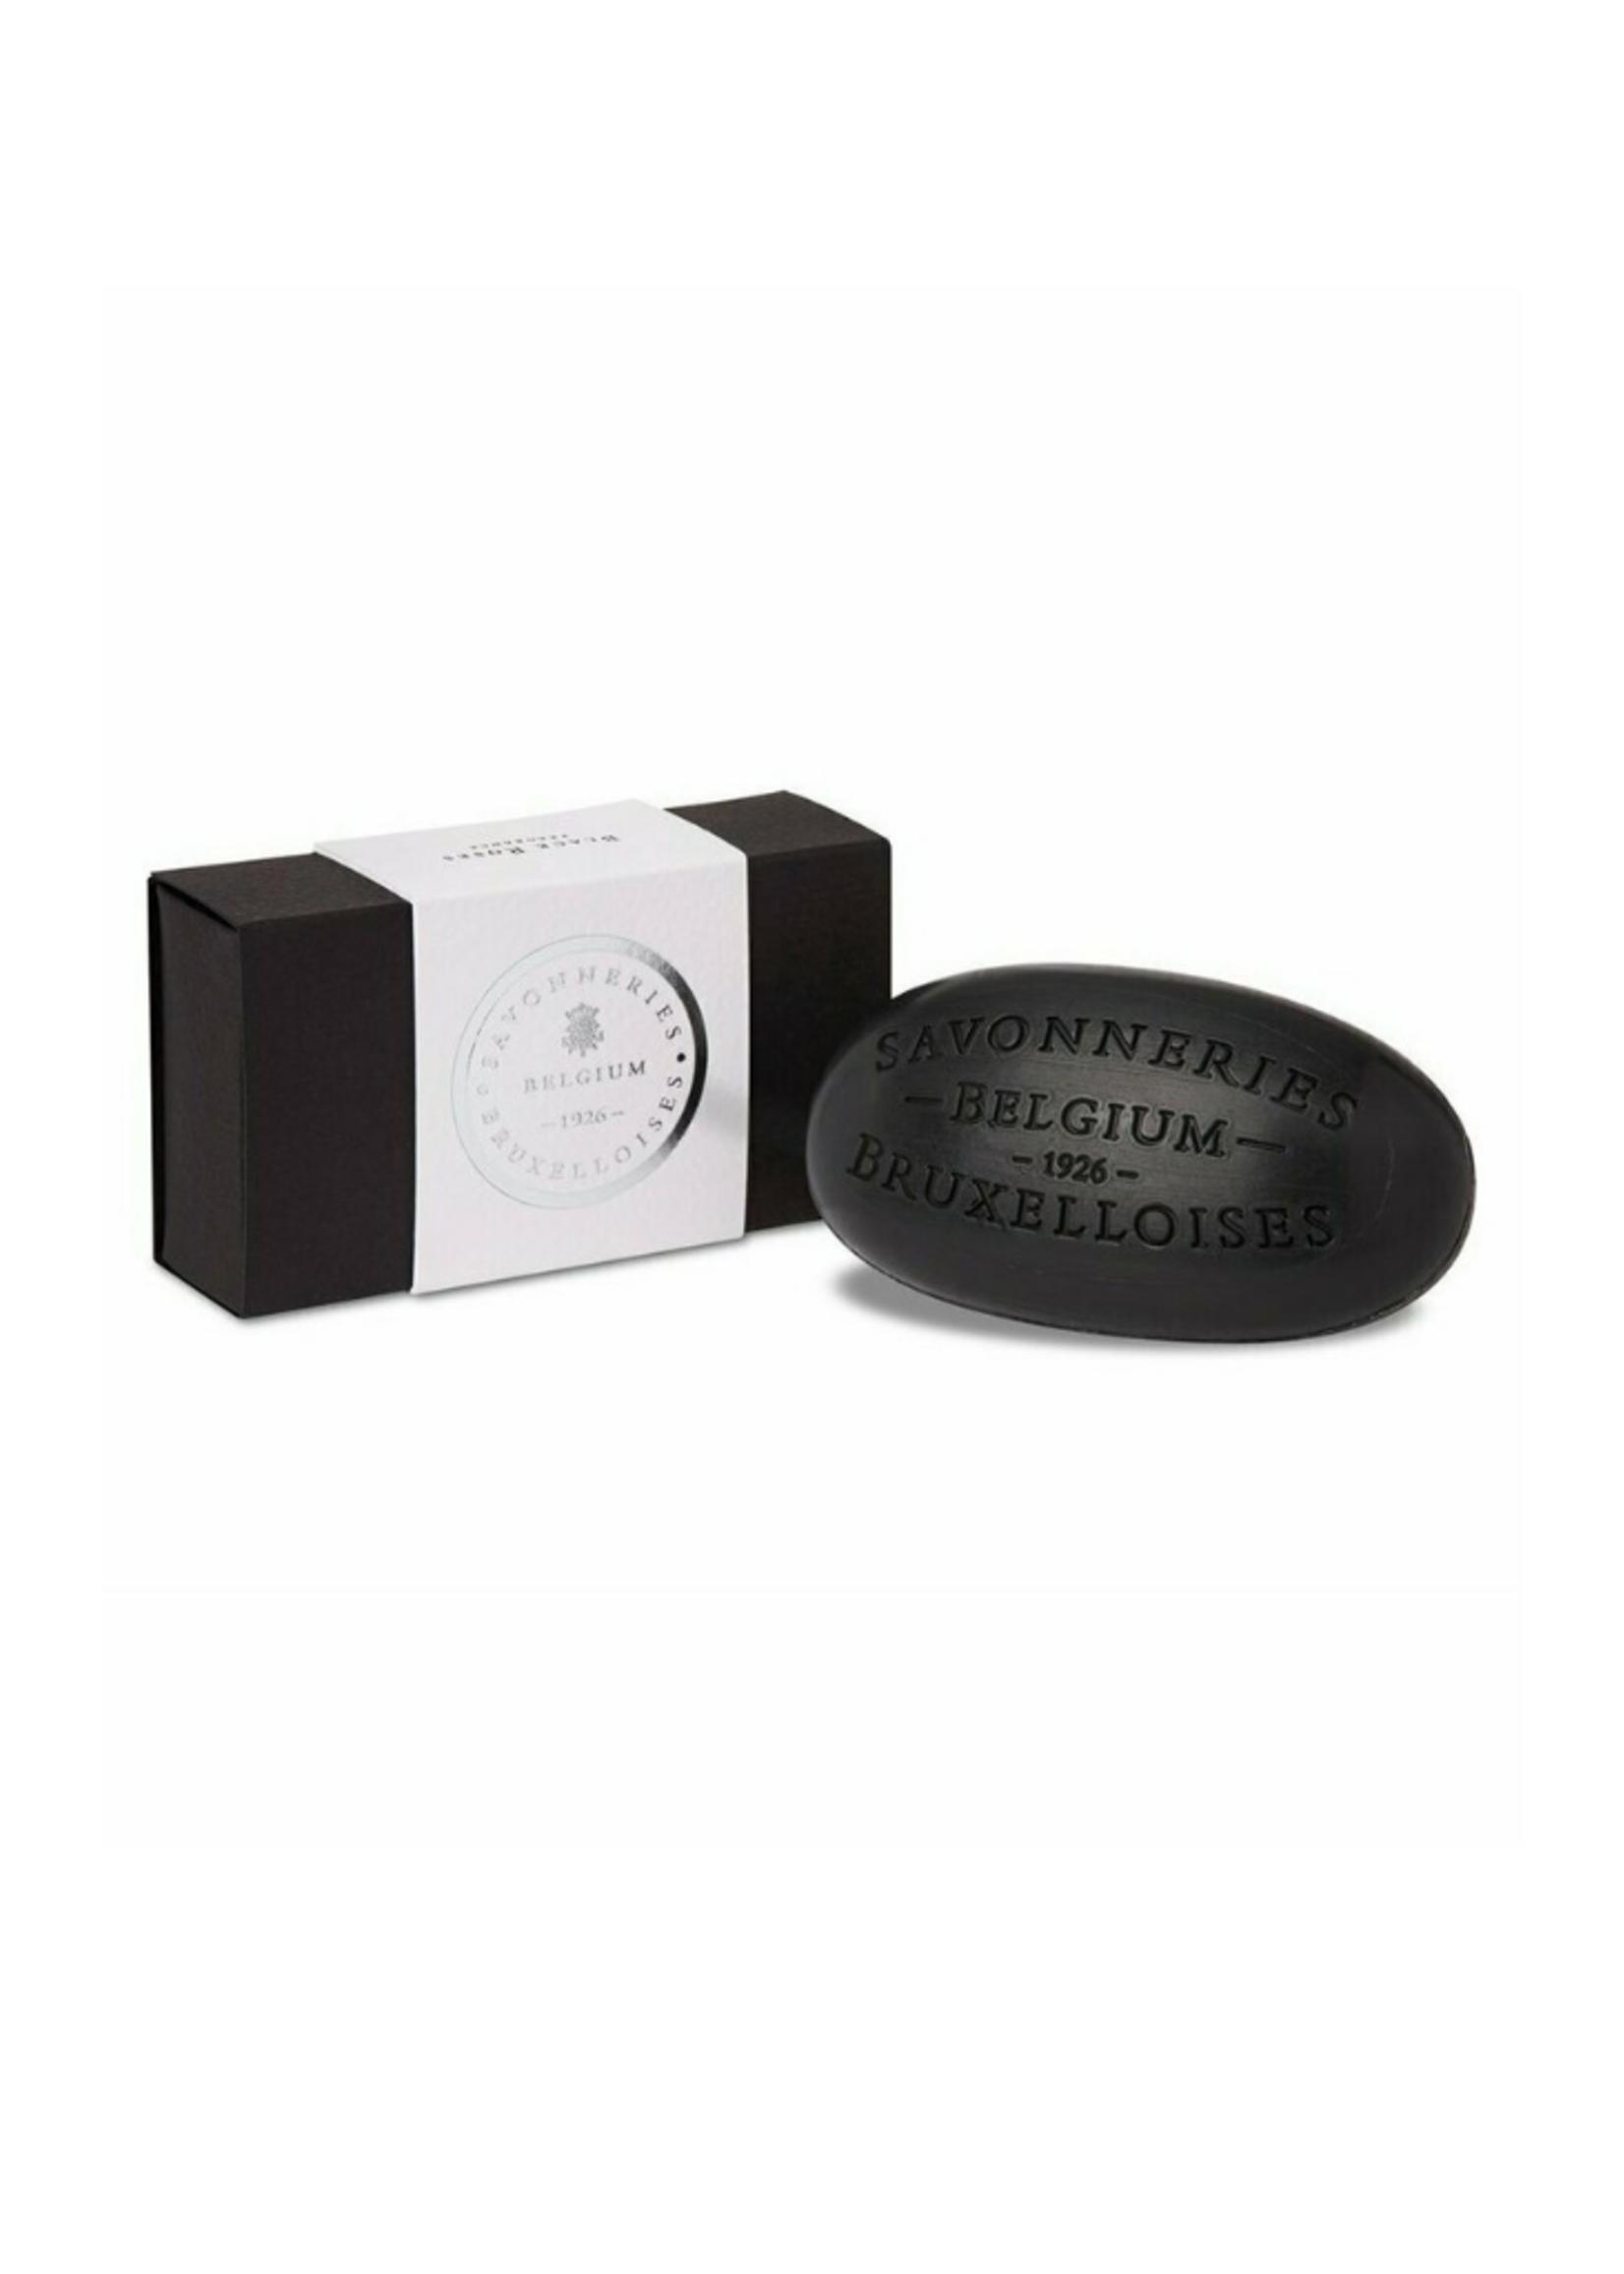 Sweet Bella Savonneries Bruxelloises Black Roses Soap